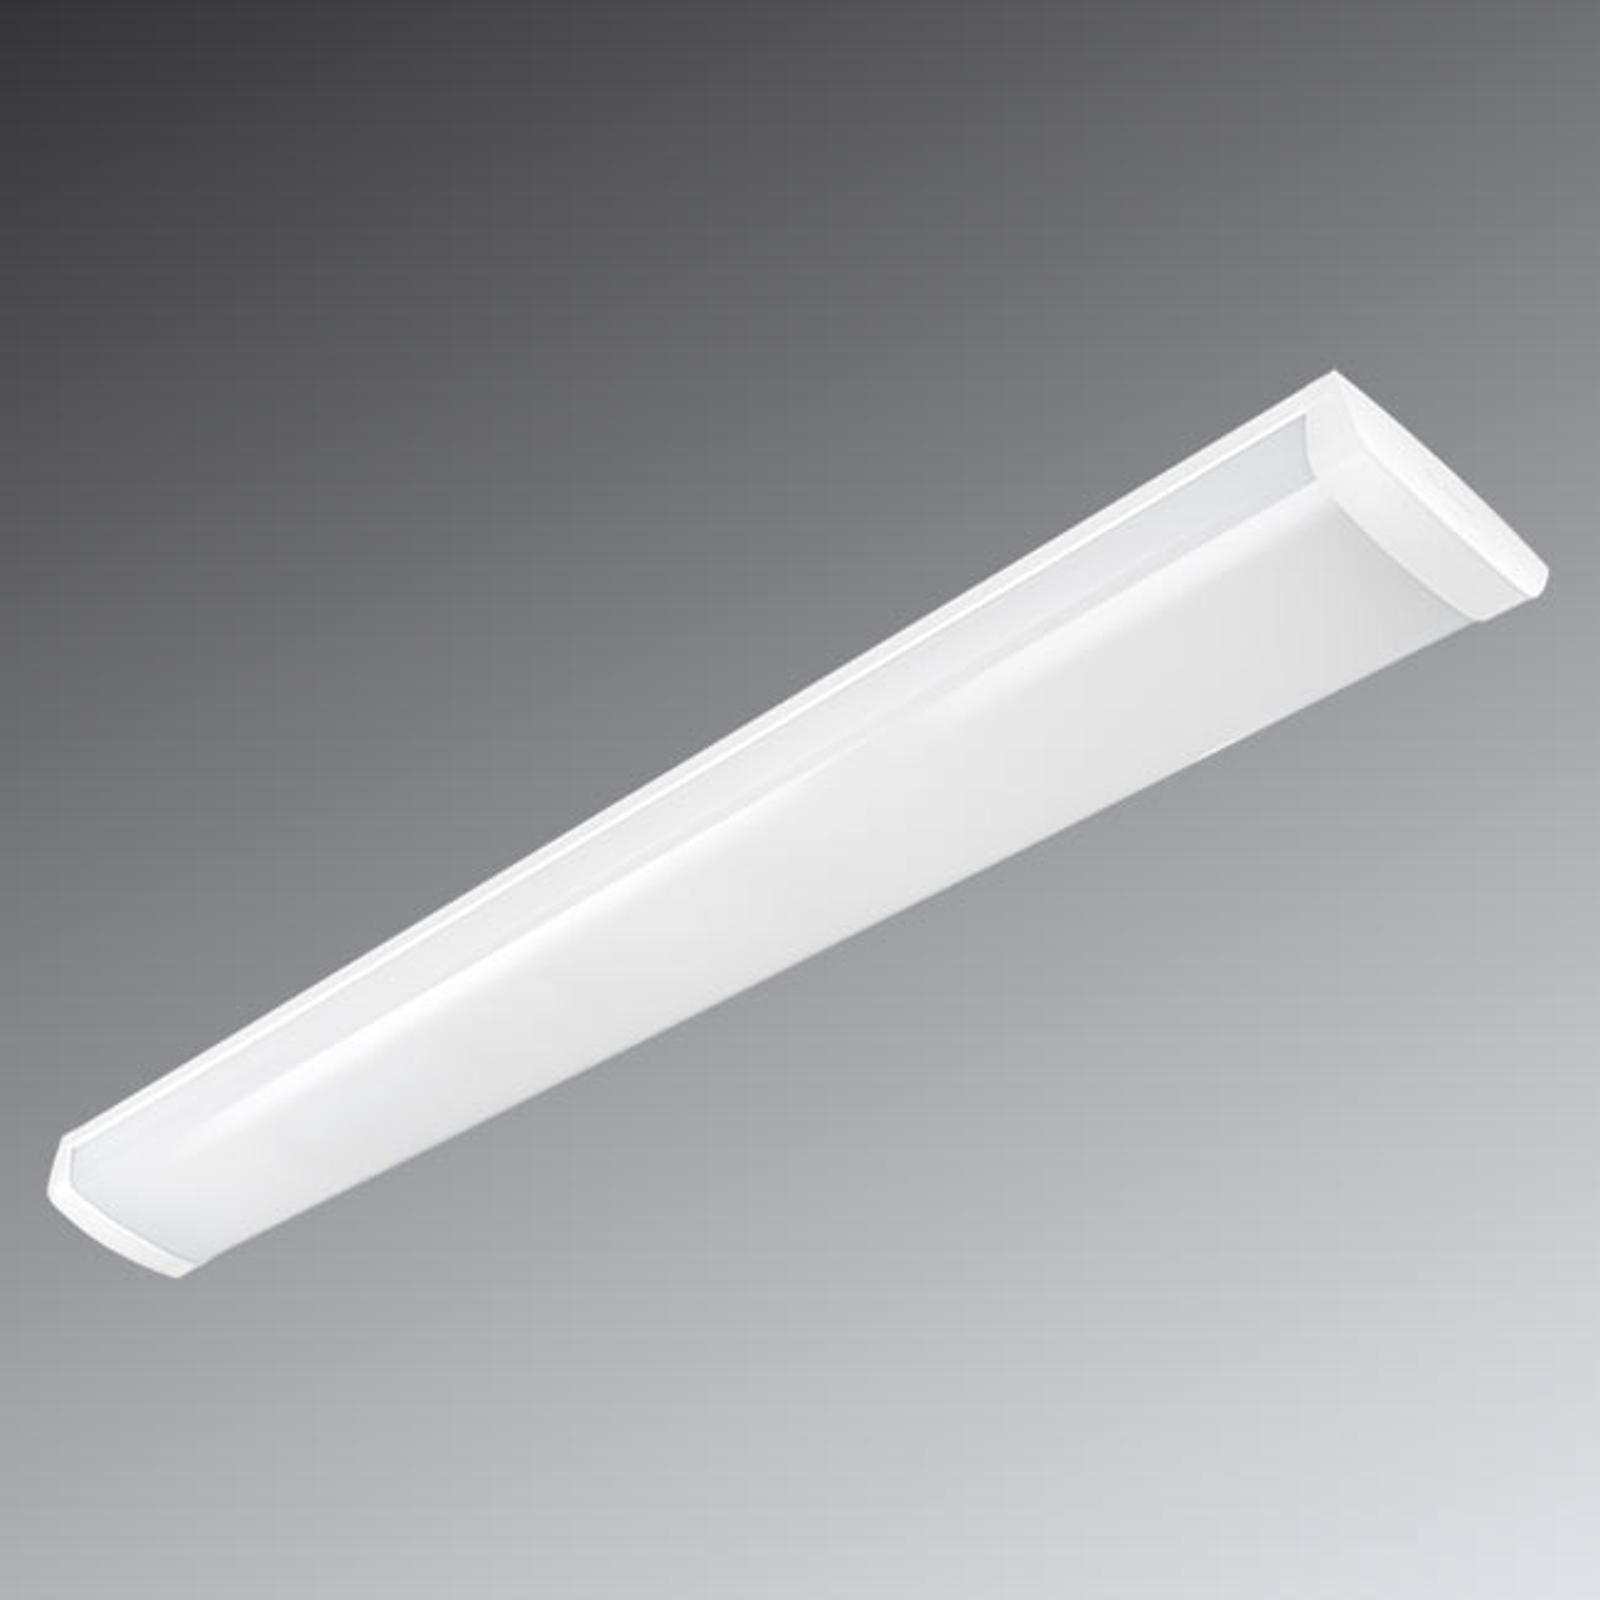 Pitkä LED-kattovalaisin i60-1500 6000 HF 4 000 K